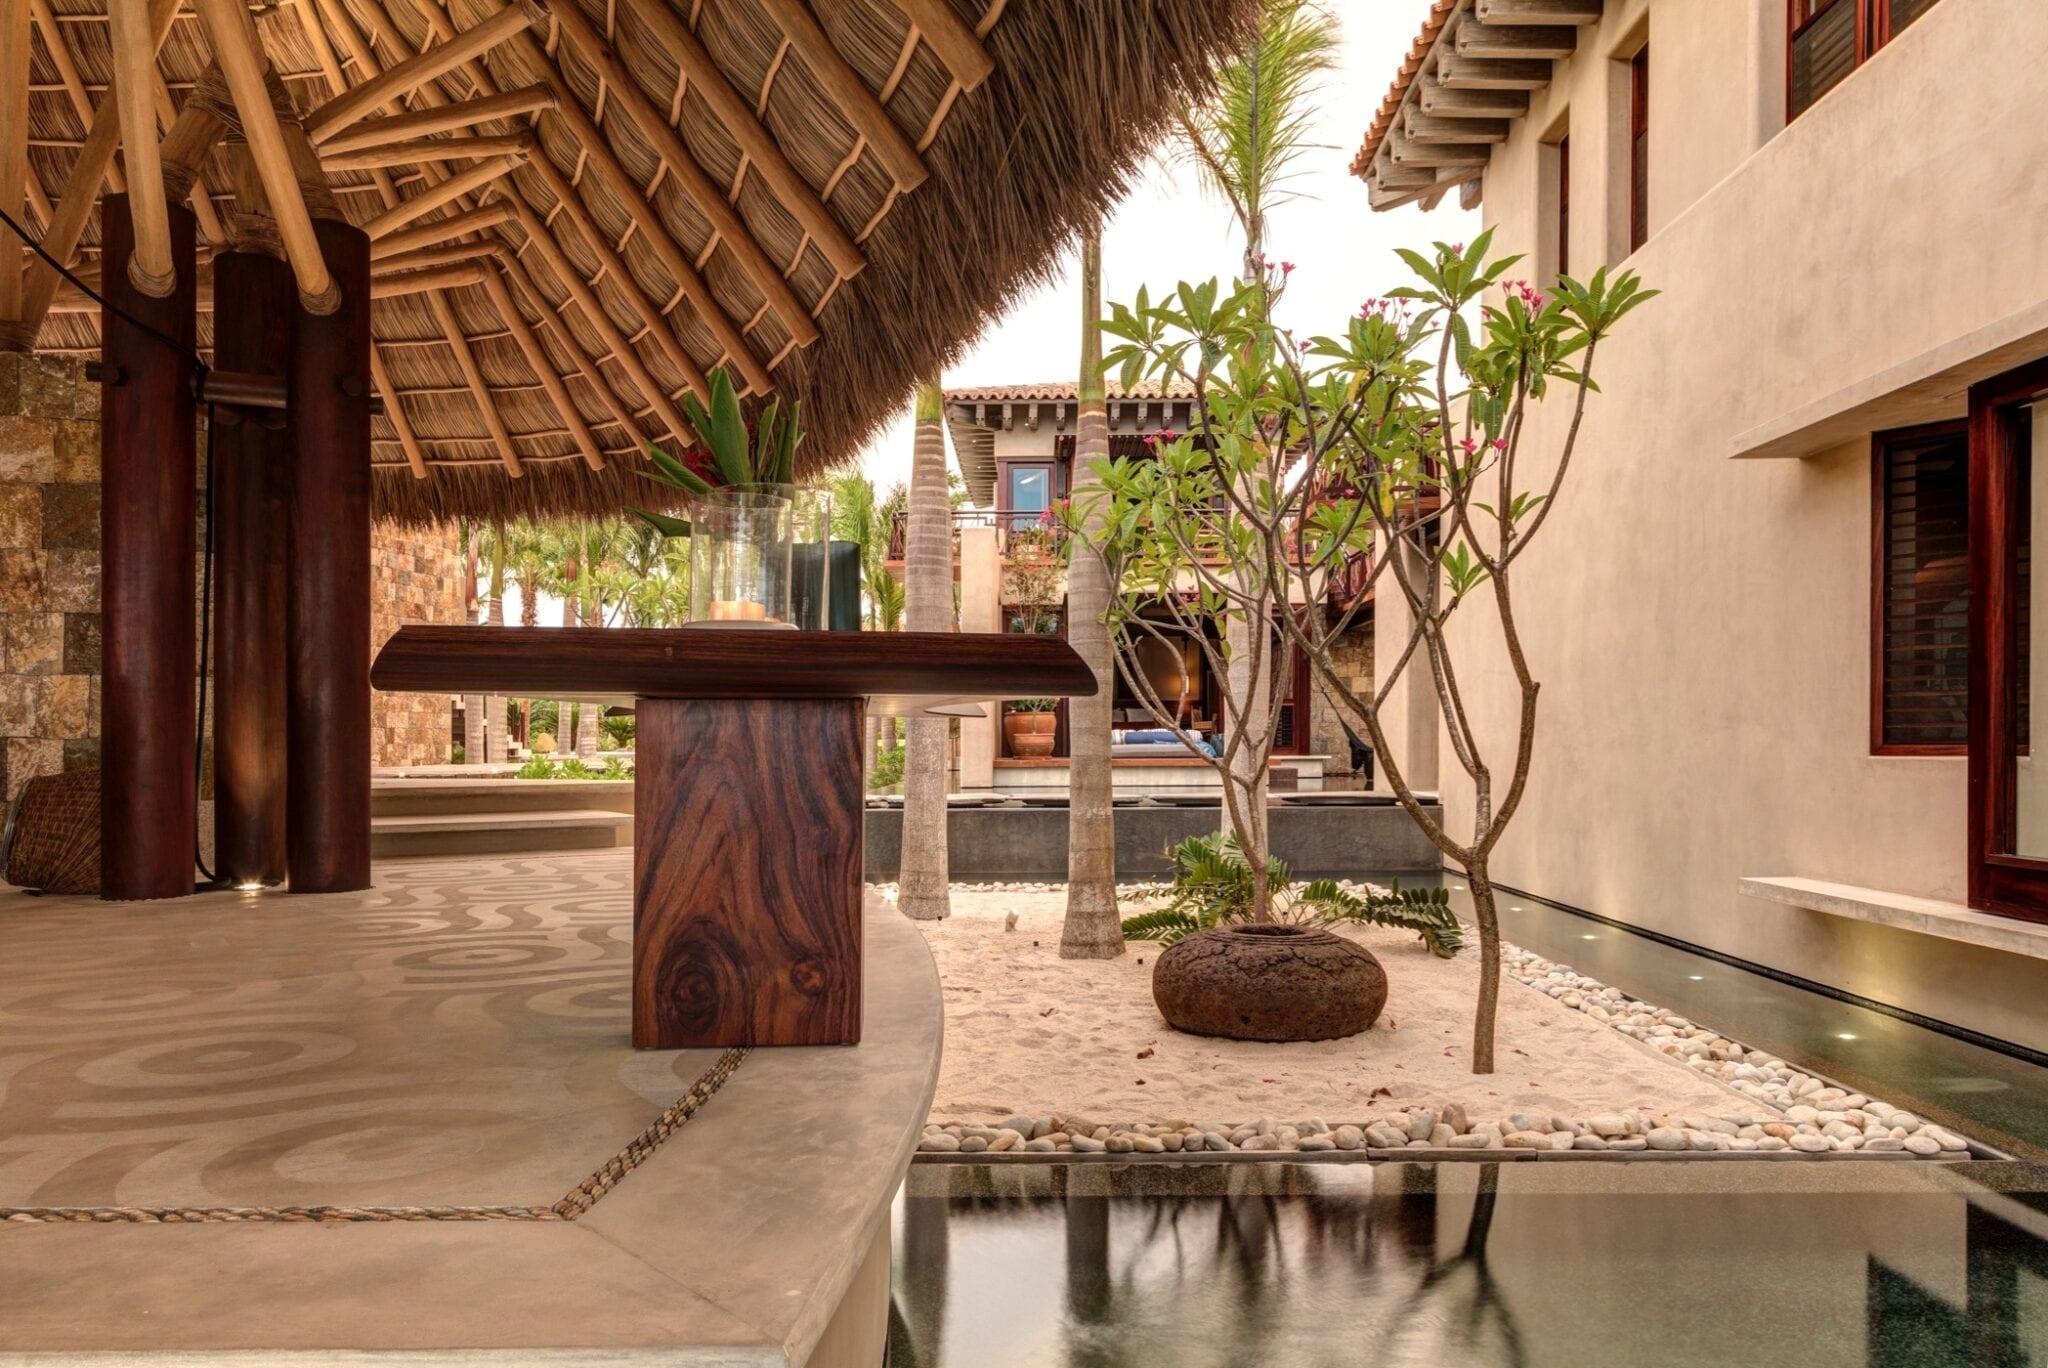 Casa Koko Detail Next To Dining Room